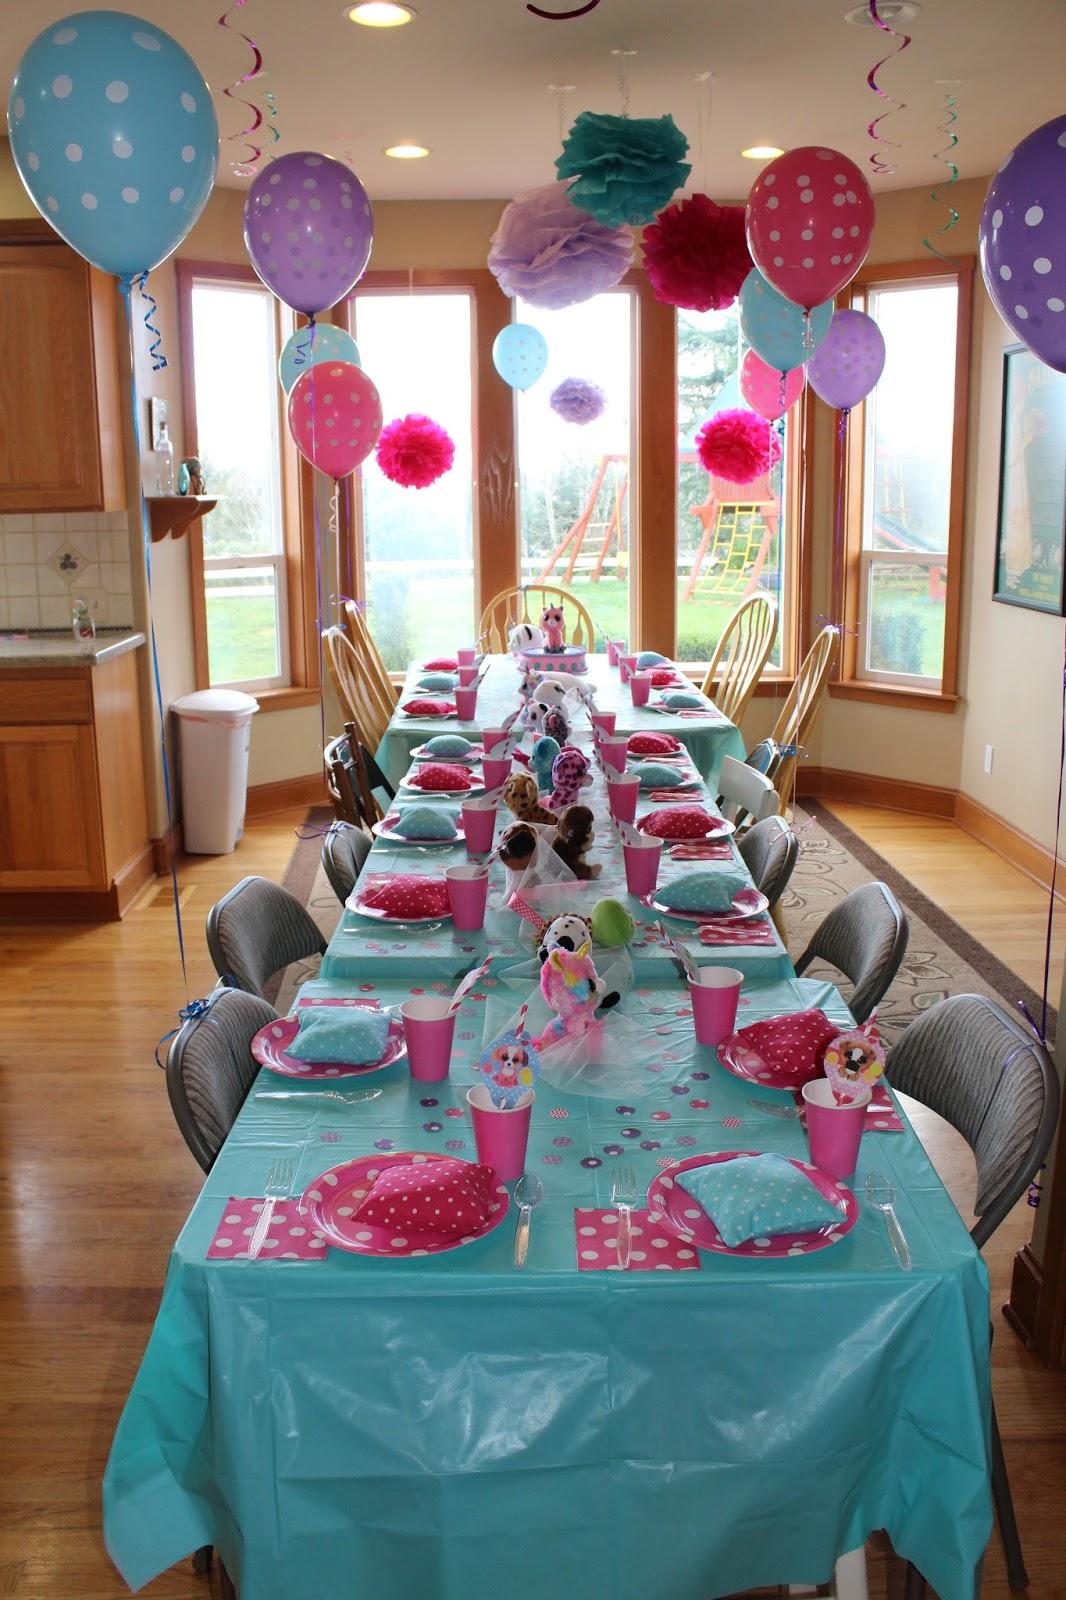 In The Hartland Lia S Beanie Boo Birthday Party